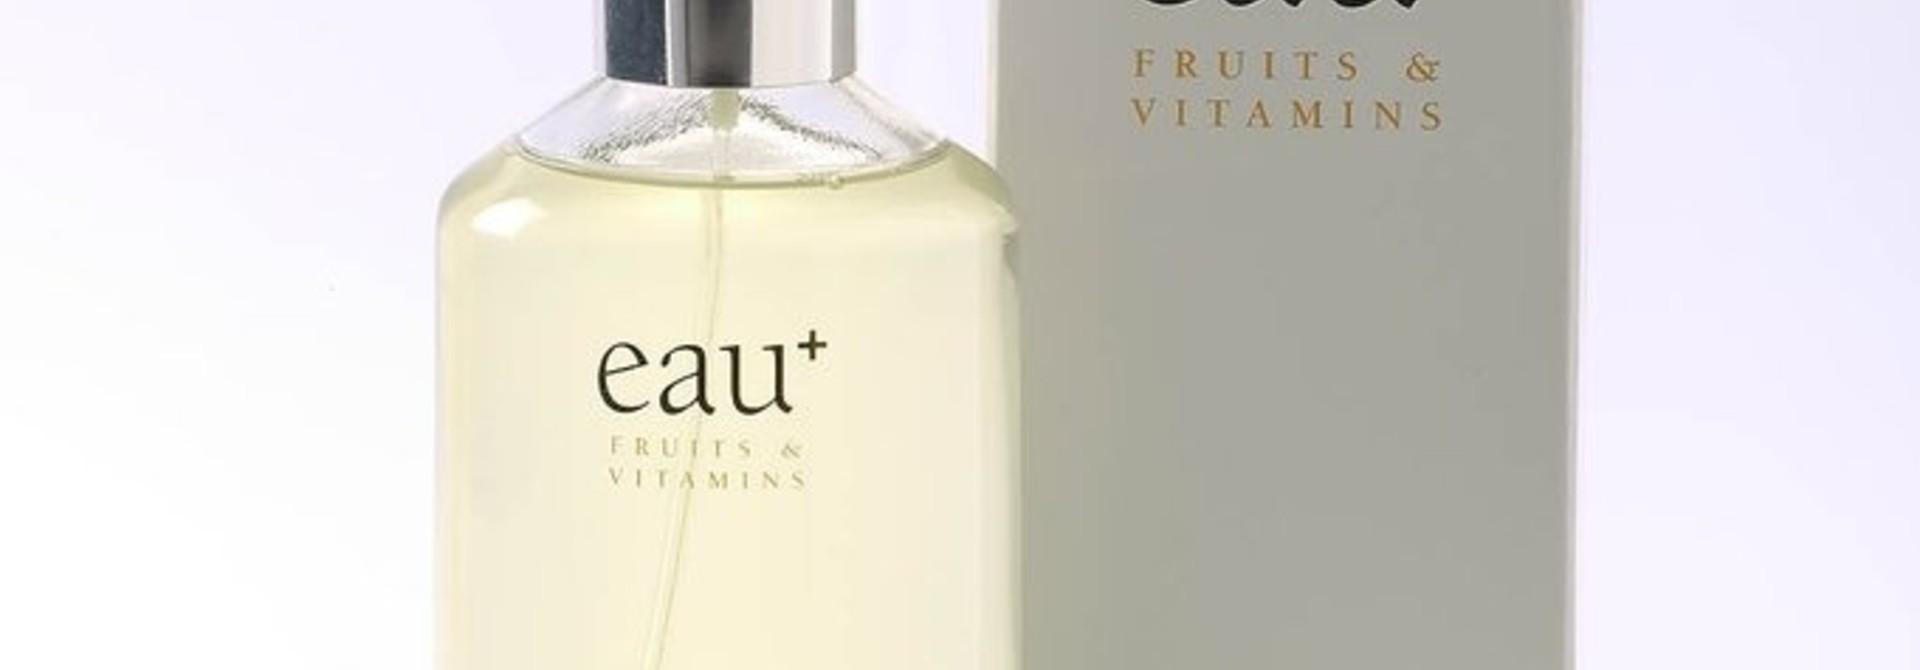 Eau + Fruits & Vitamins - Body Spray